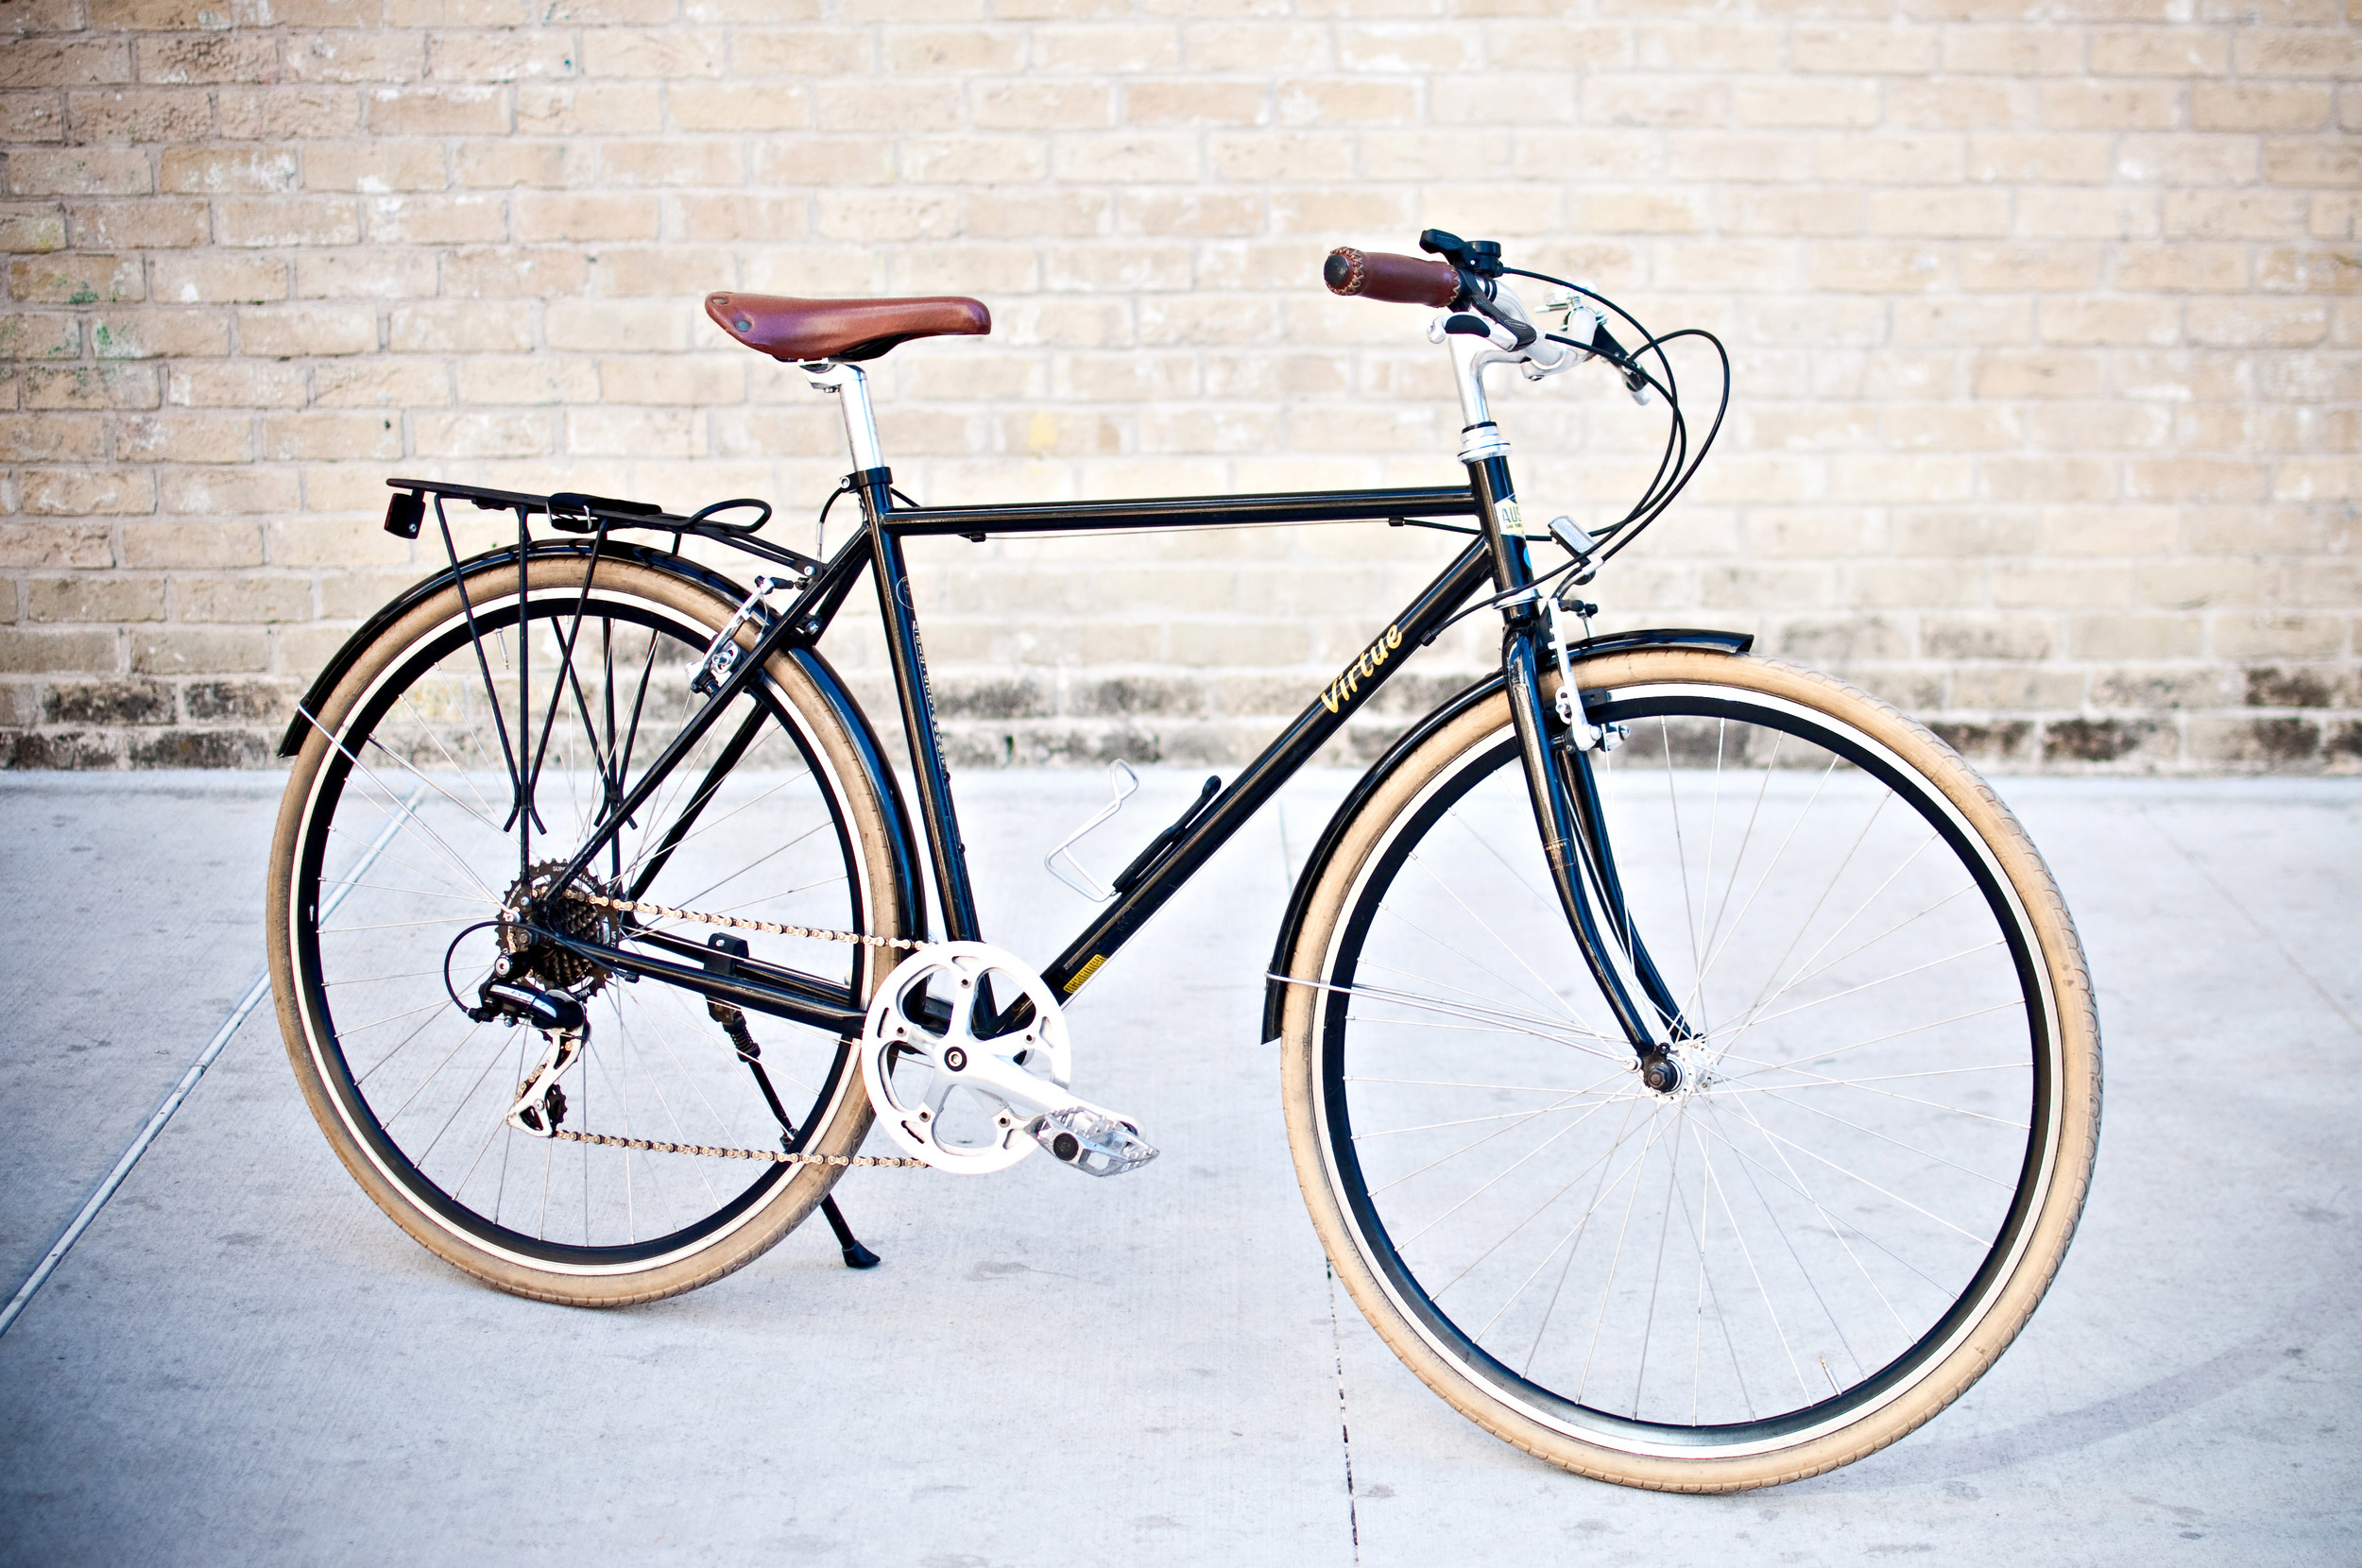 City Bike Rental in Austin, TX